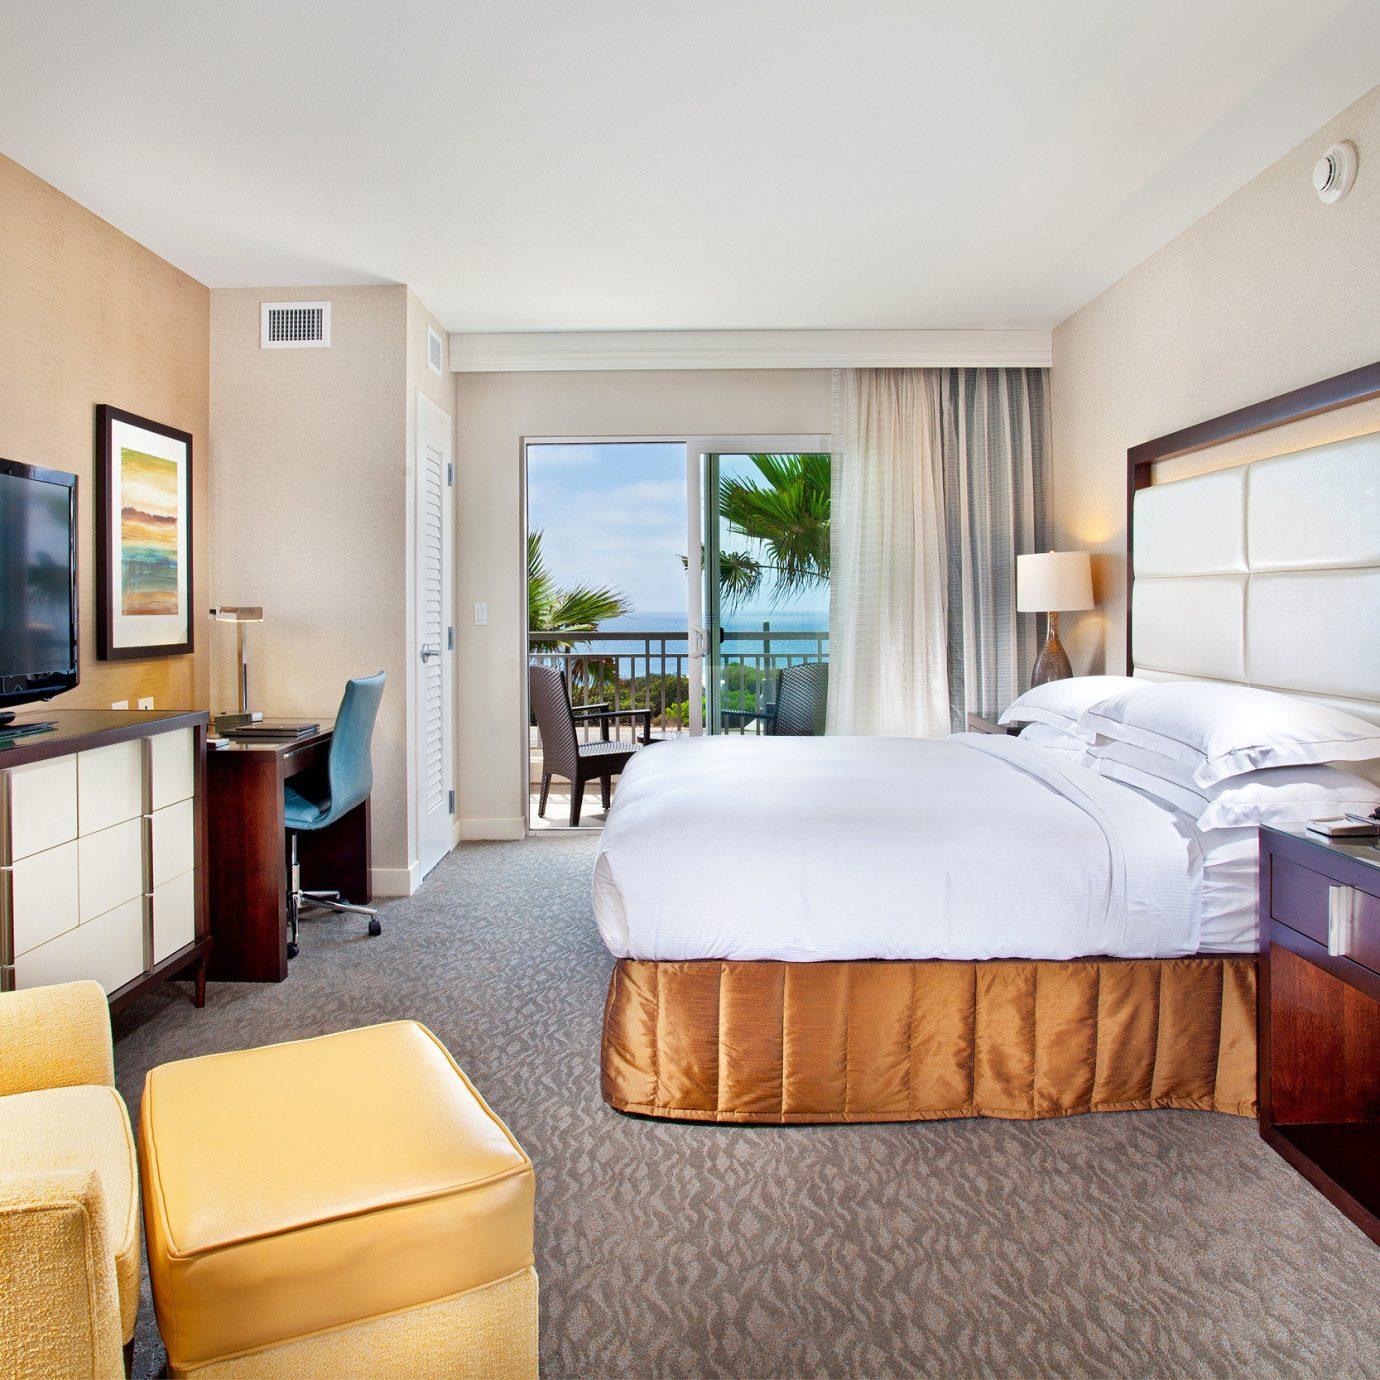 Balcony Bedroom Ocean Scenic views Waterfront sofa property Suite condominium living room home cottage Villa flat